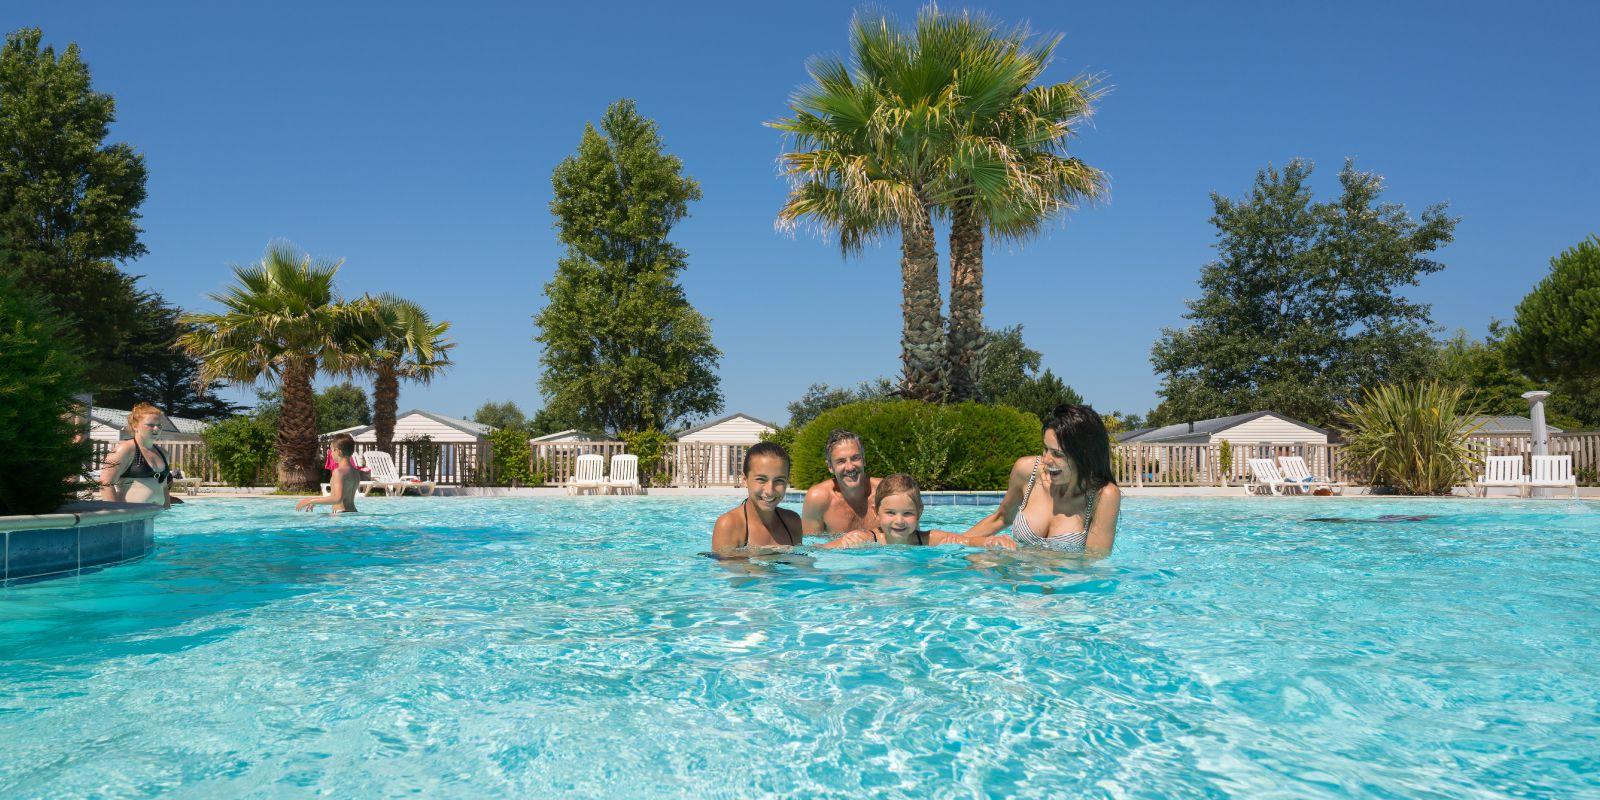 Image plage bretagne photos camping bretagne avec for Camping avec piscine bretagne